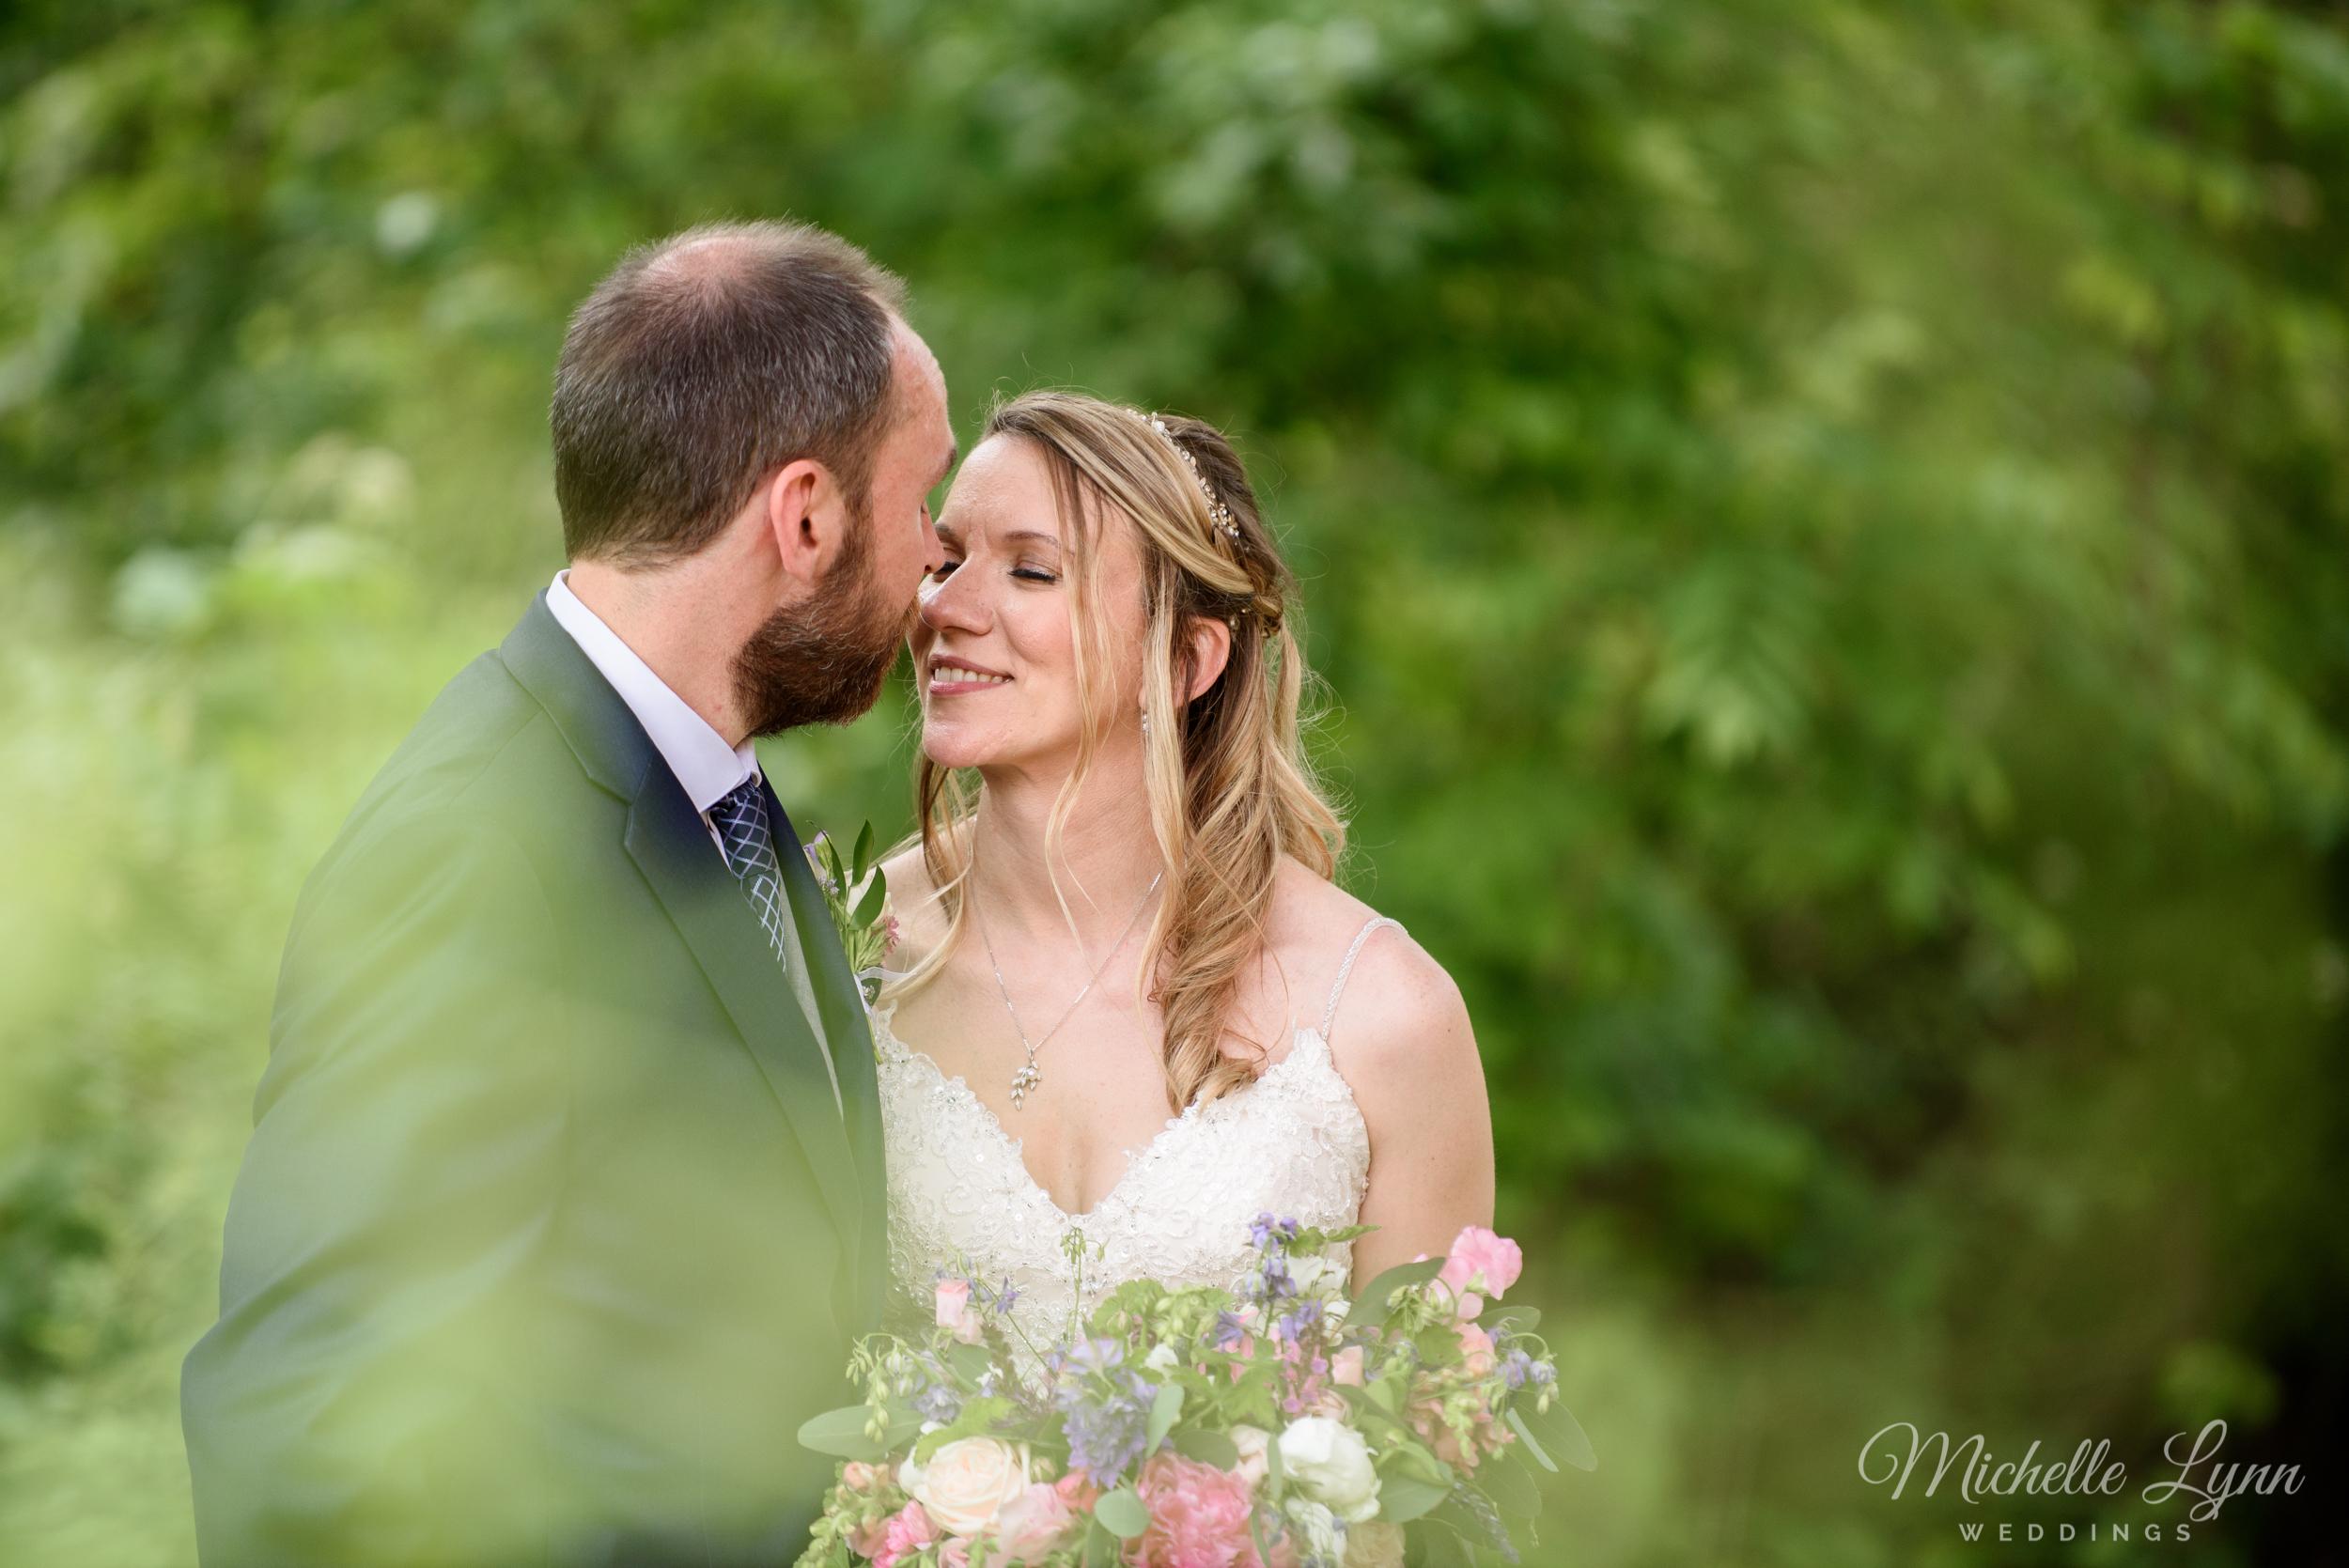 mlw-prallsville-mills-nj-wedding-photographer-56.jpg